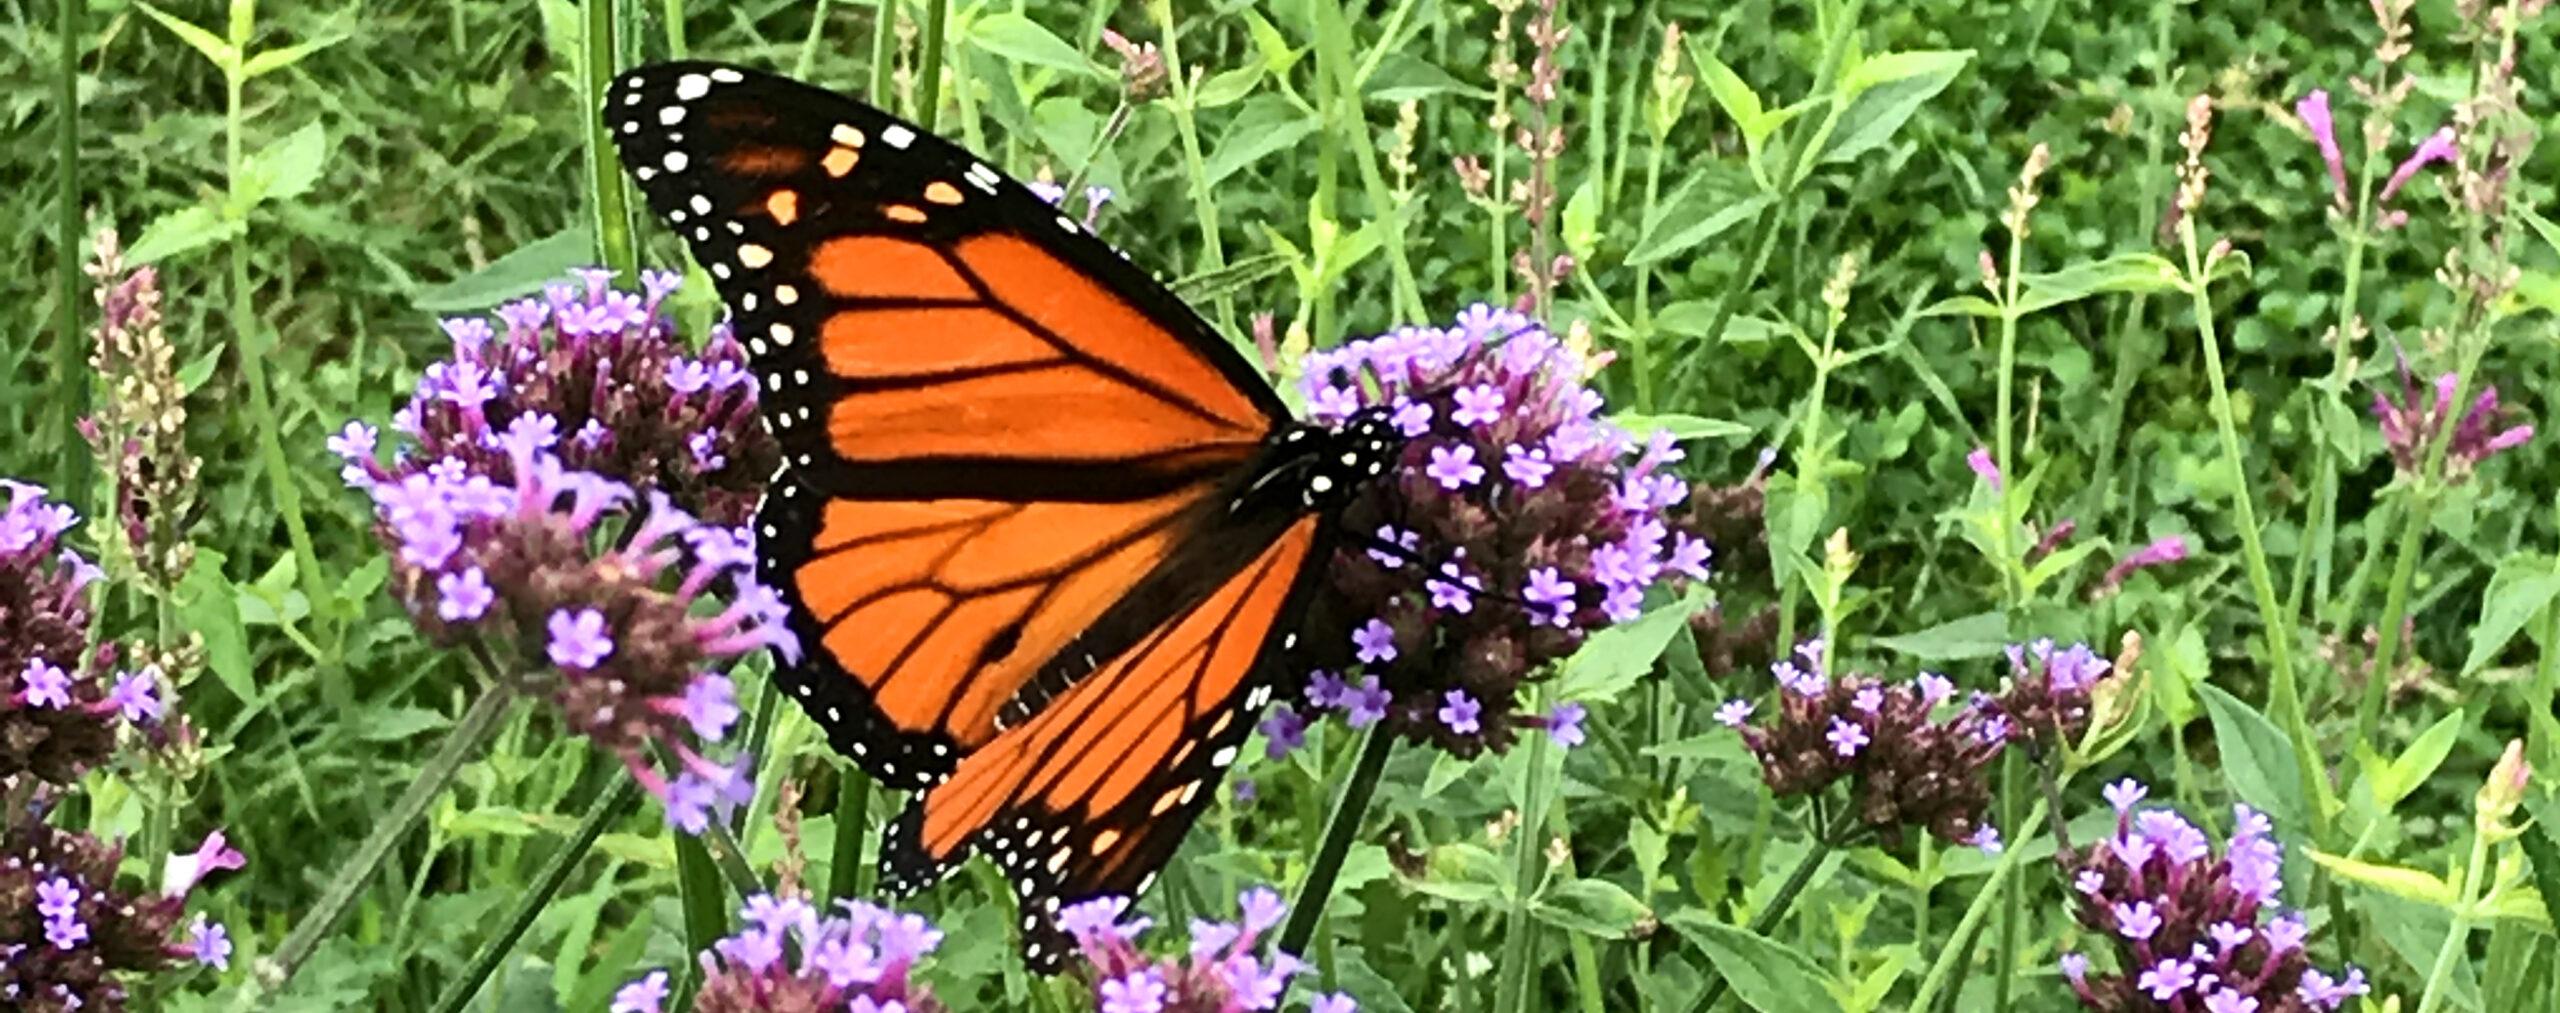 orange monarch butterfly on purple verbena bonarienses flower